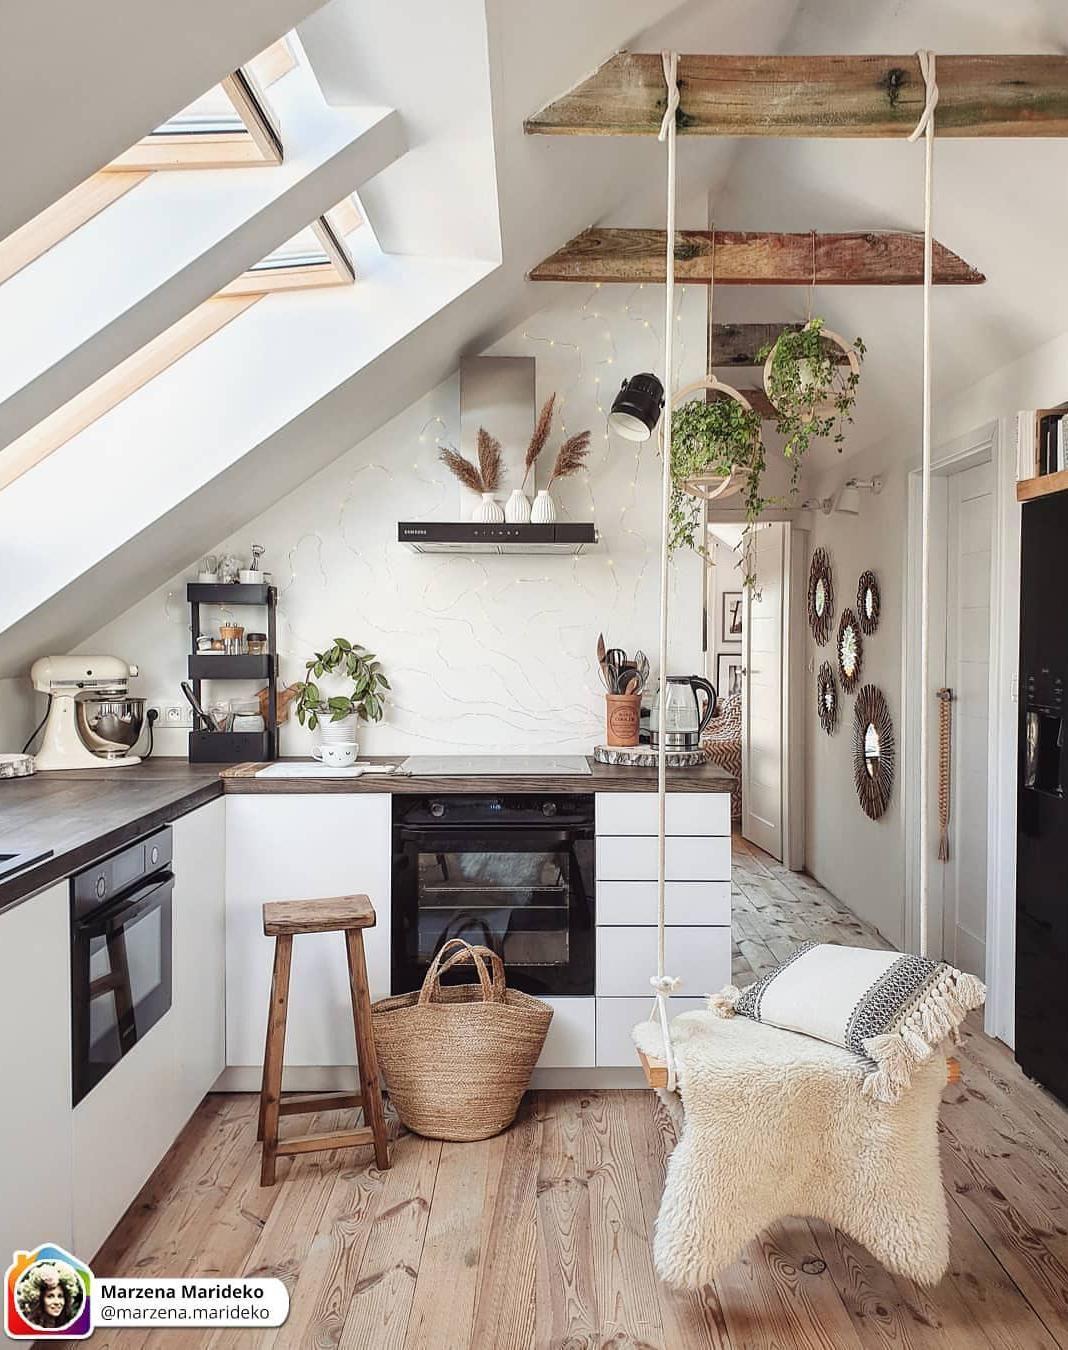 50 Cool Attic Kitchen Design Ideas In 2020 Small Apartment Decorating Home House Interior